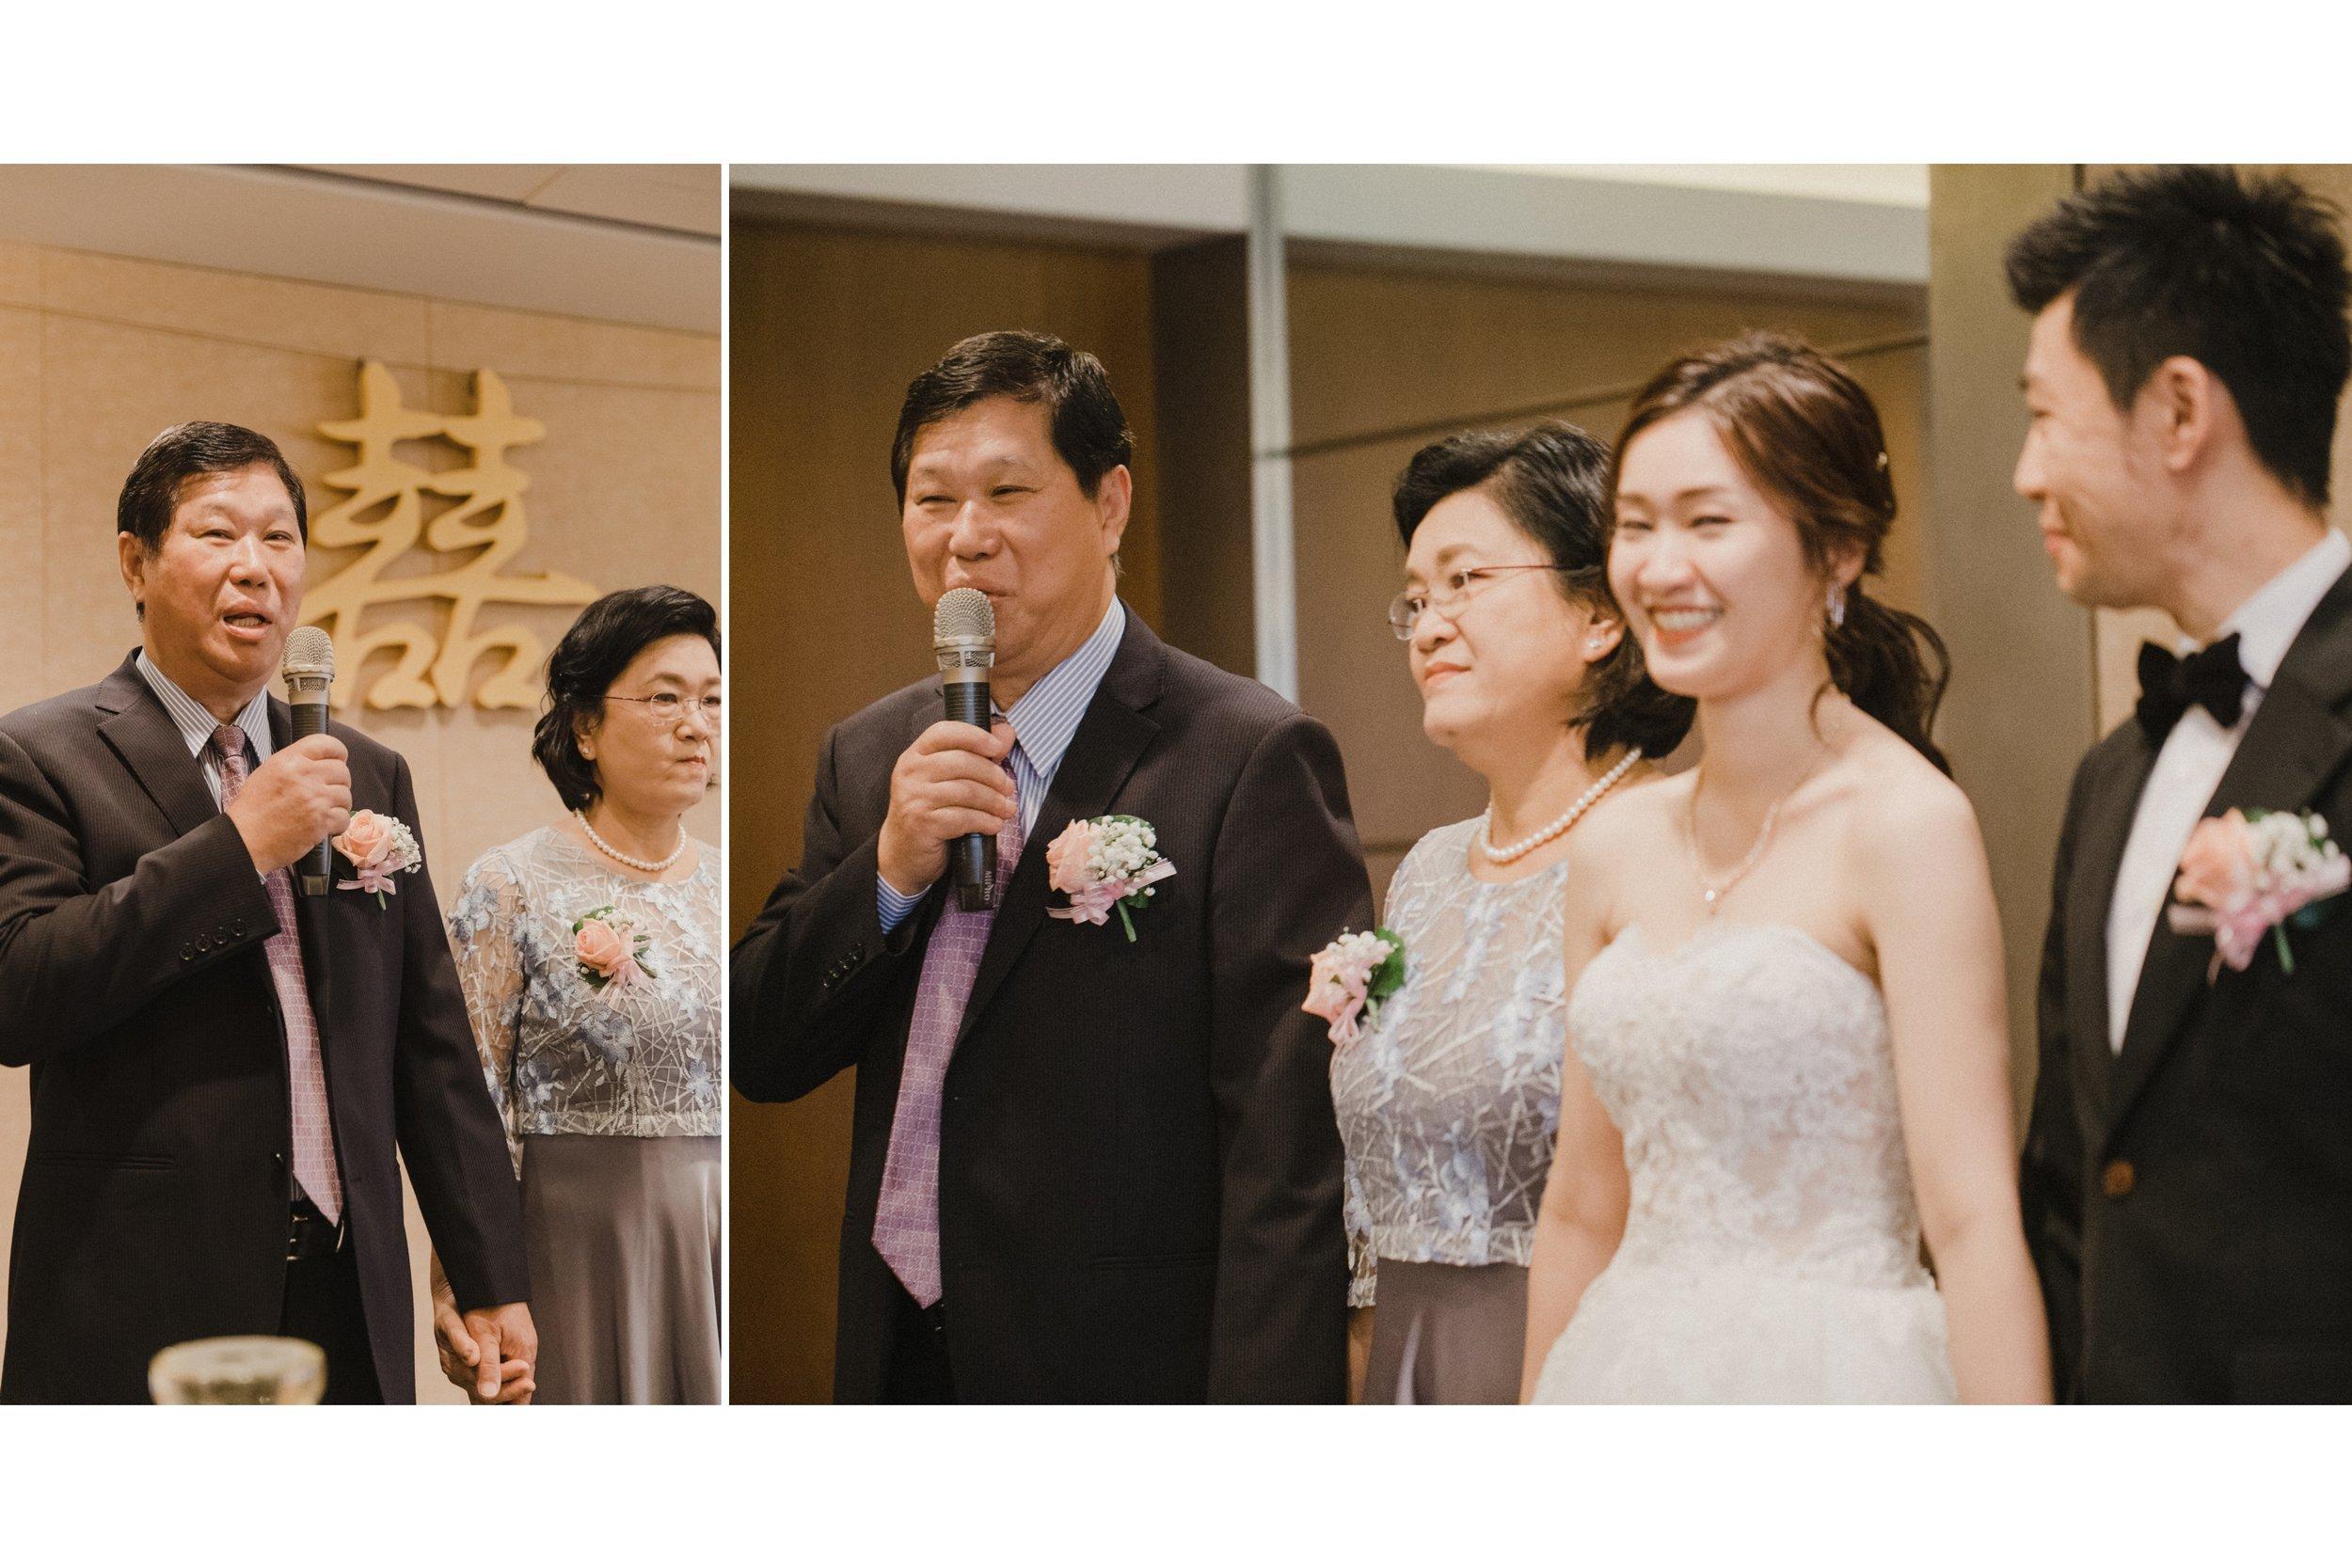 wedding-caridee-oscar-lunch-ambassador-hsinchu-結婚午宴-新竹國賓_84.jpg